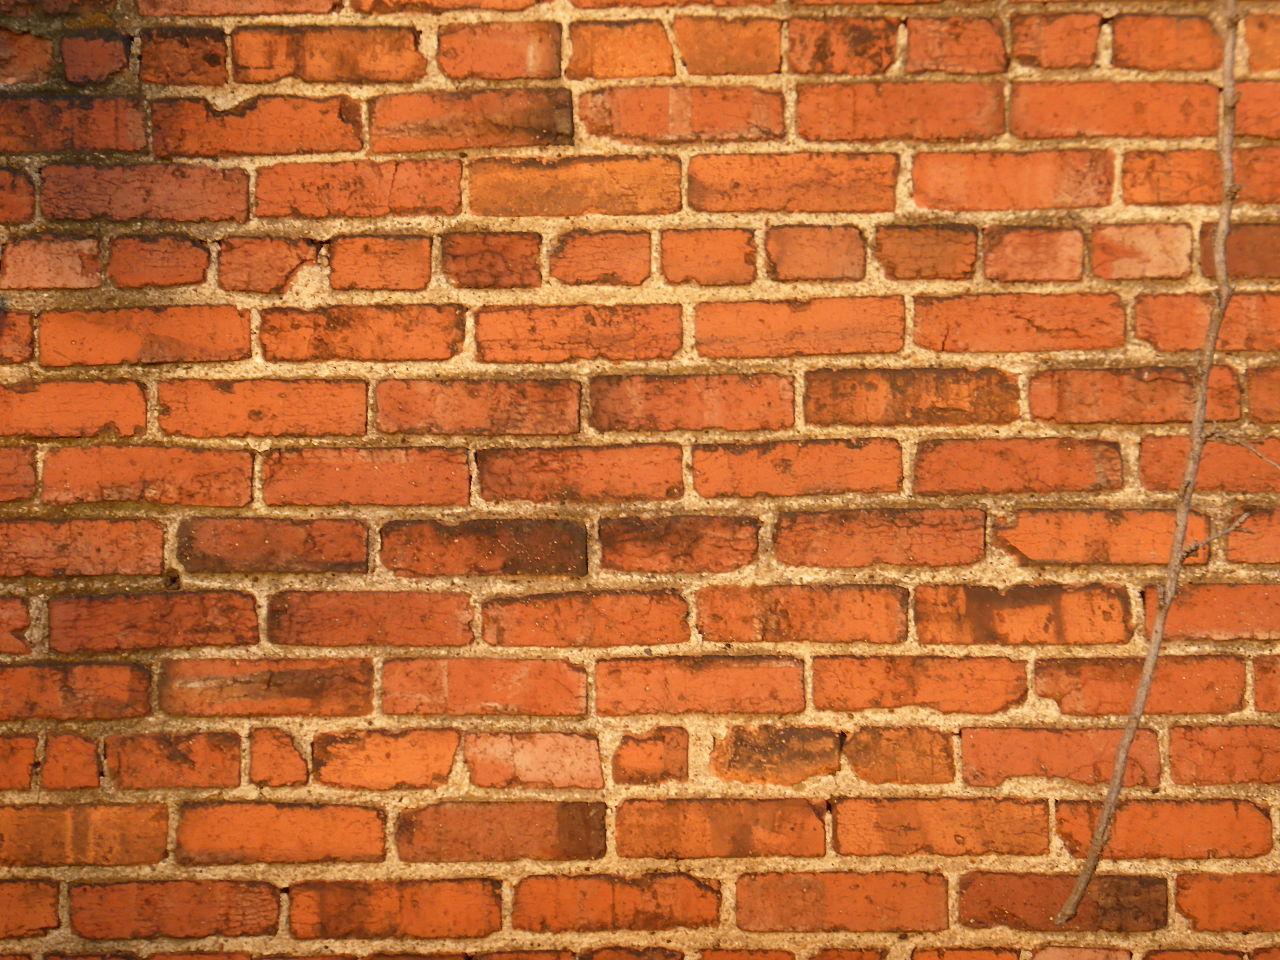 File:Red-brick-wall-texture-3.jpg